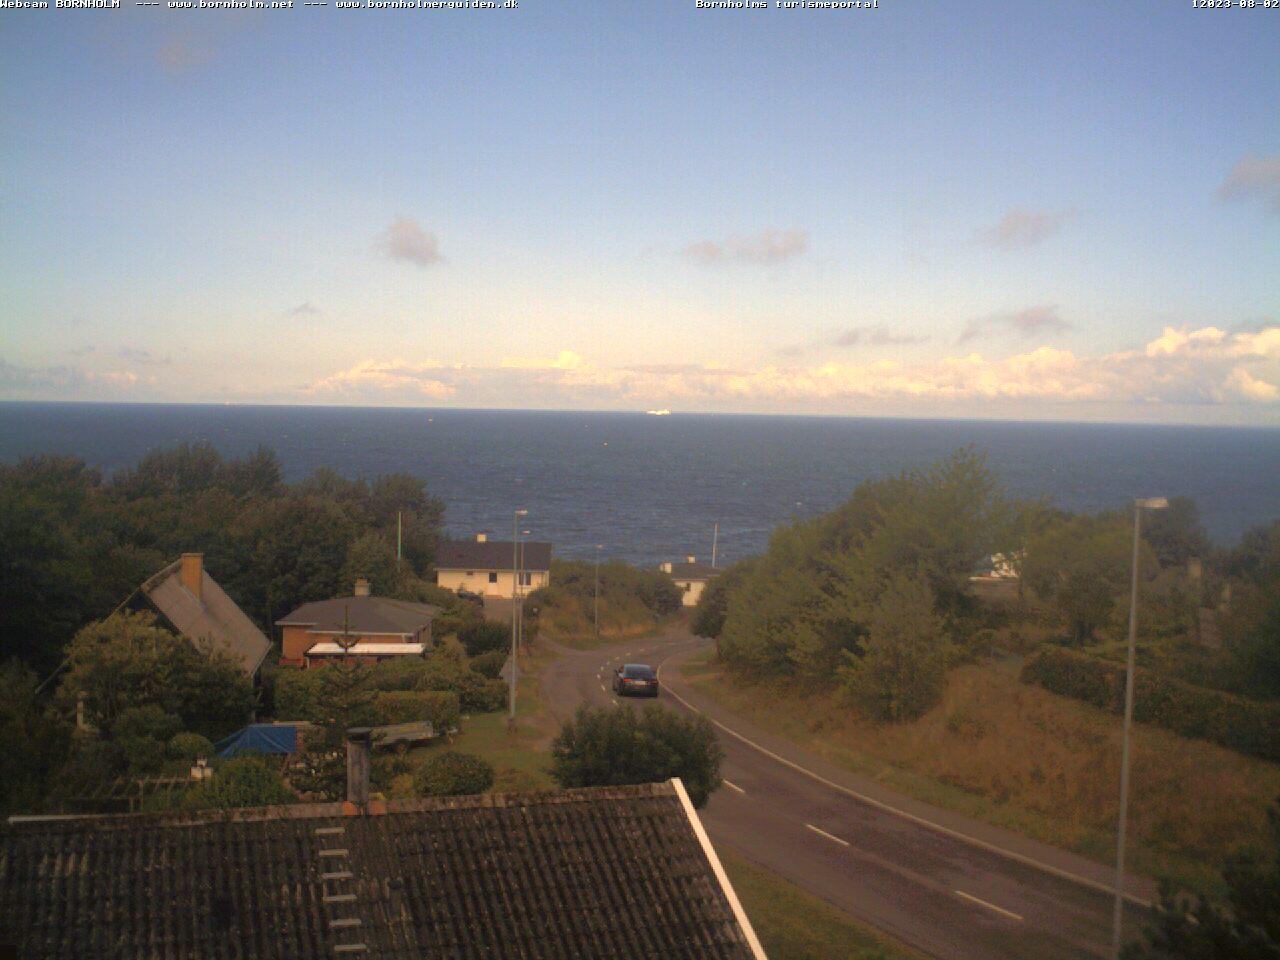 Webcam Bornholm